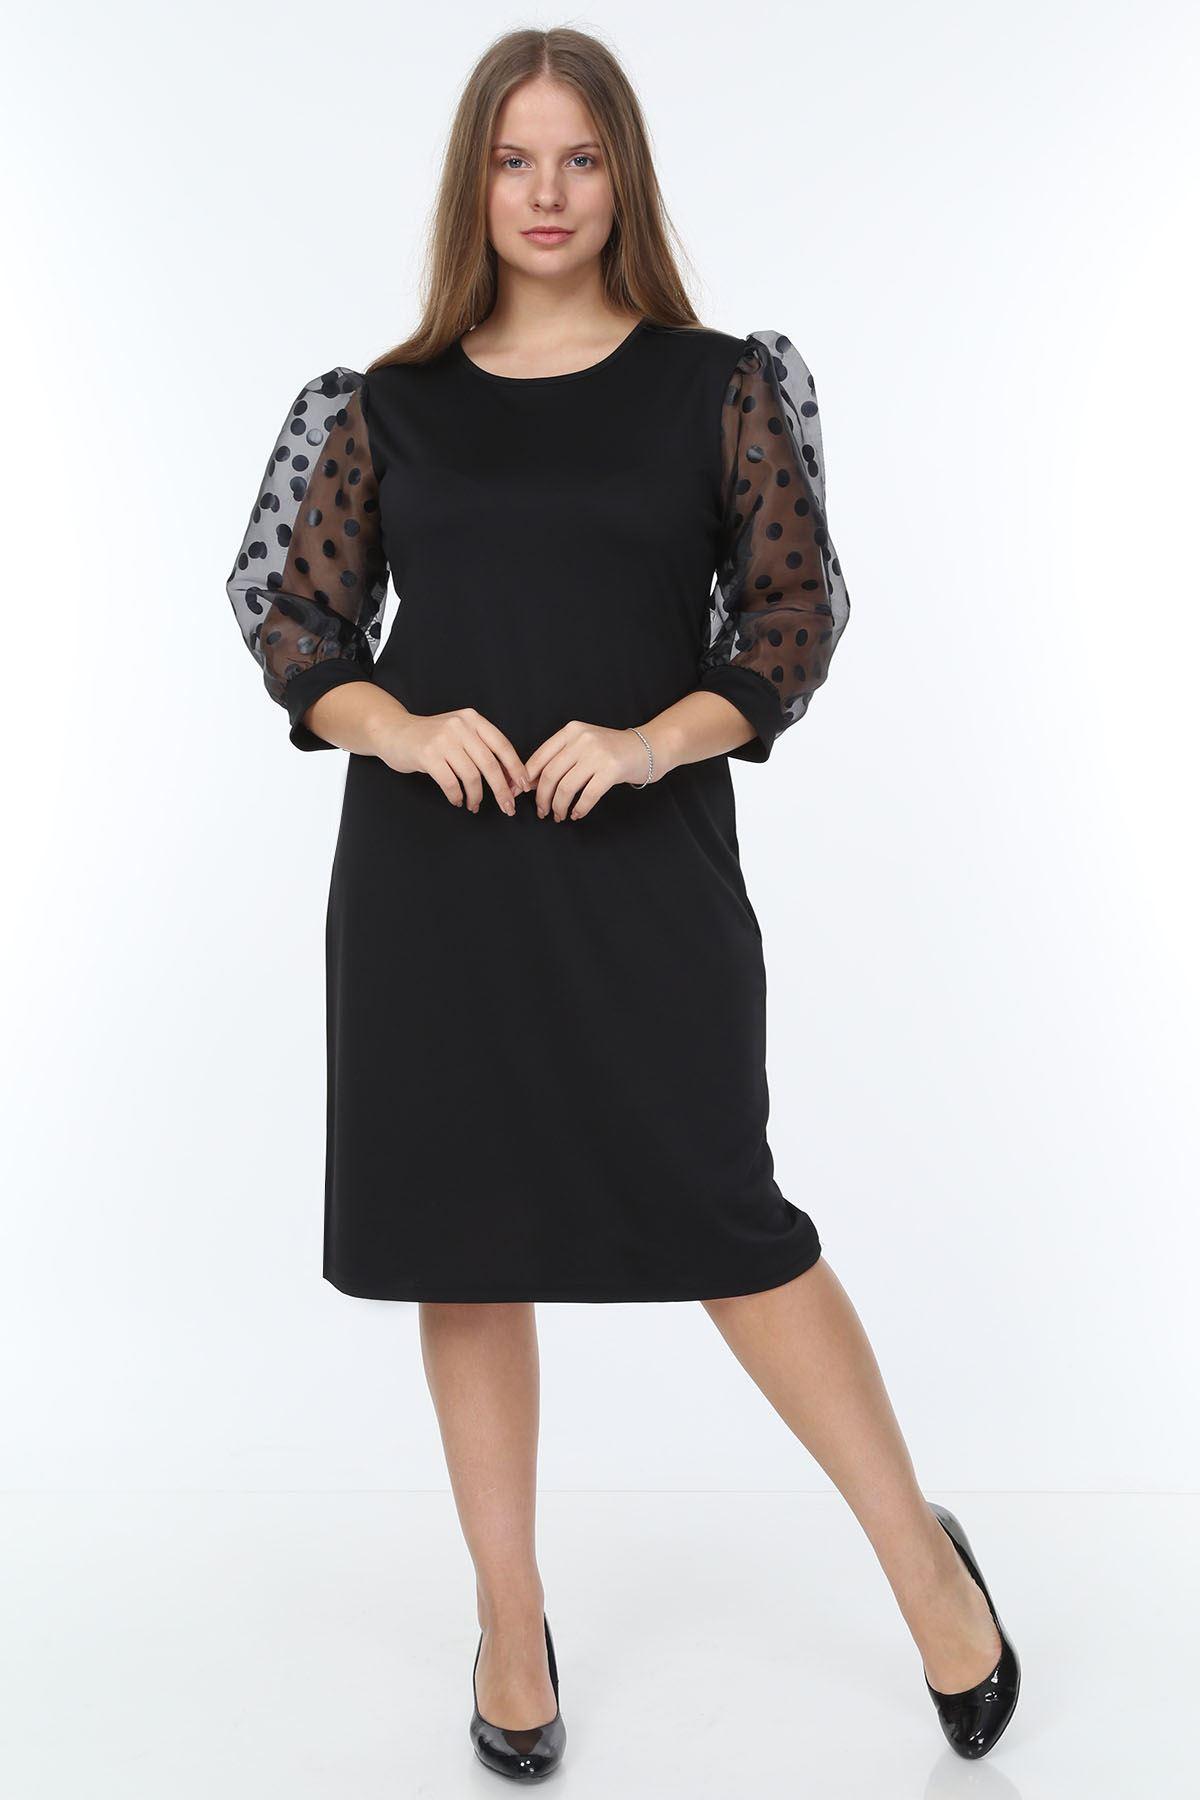 Organze Puanlı Kol Büyük Beden Elbise 23E-0933